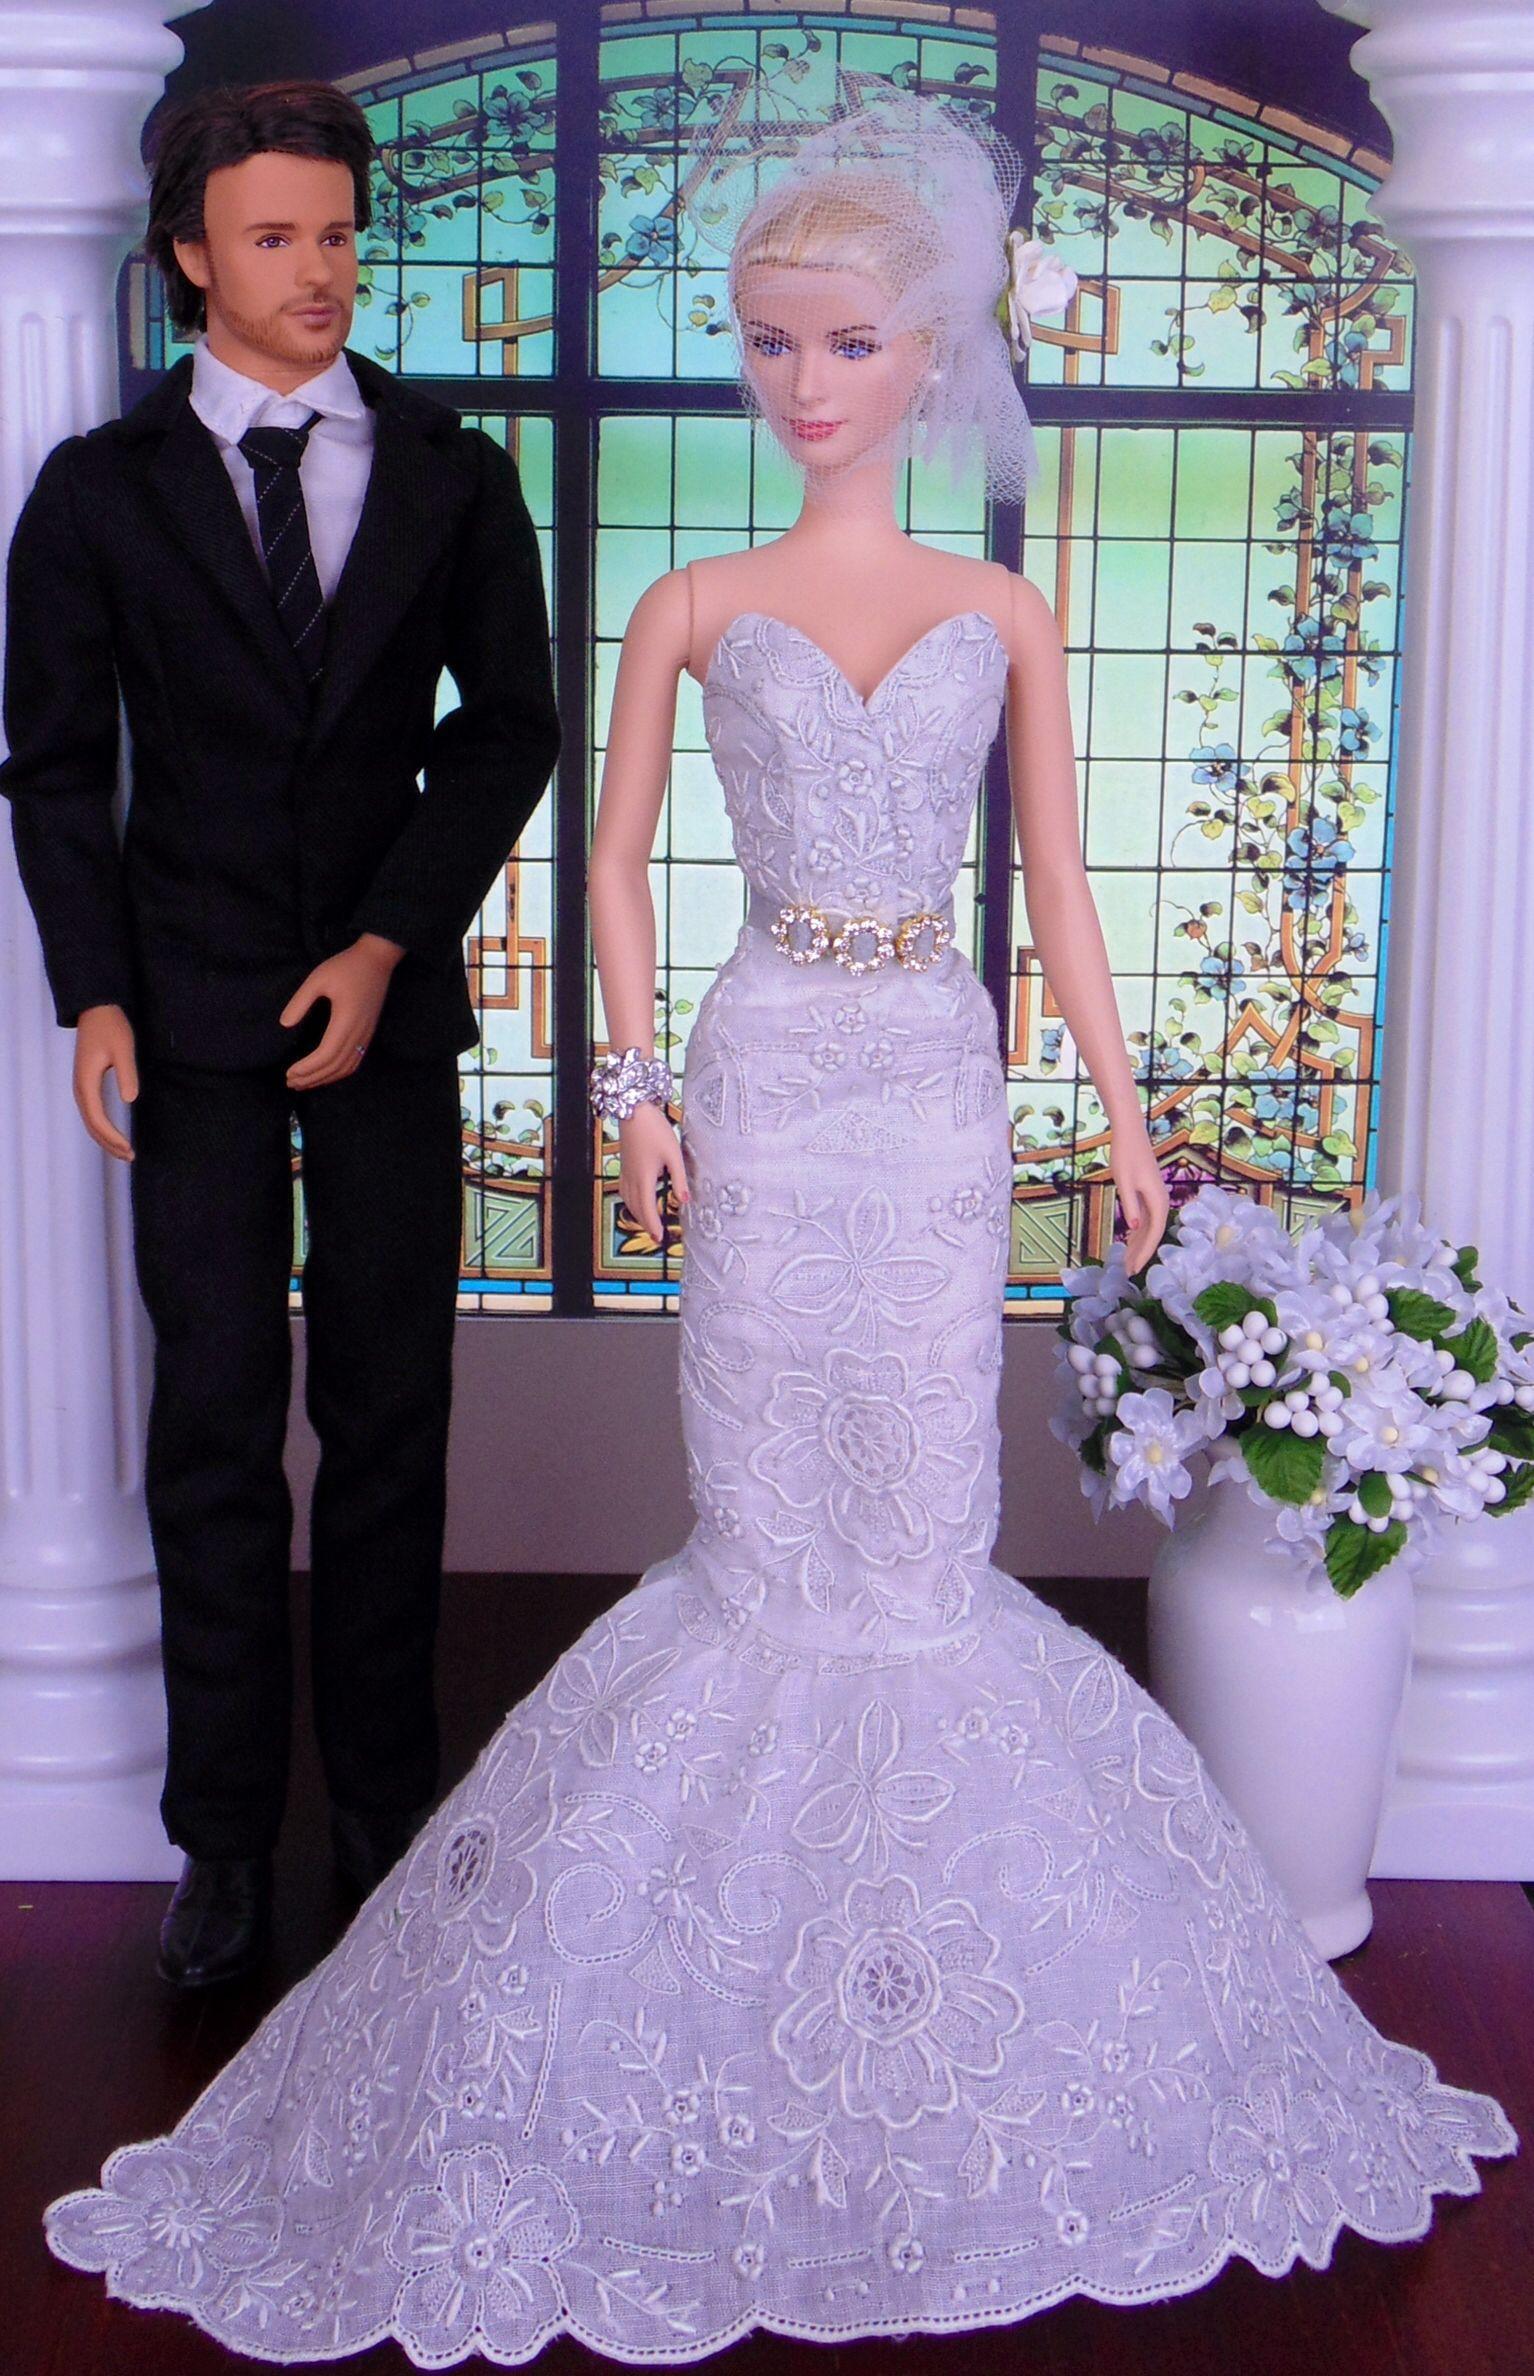 Wedding dress by Hankie Chic   DOLLS WEDDING DRESS   Pinterest ...